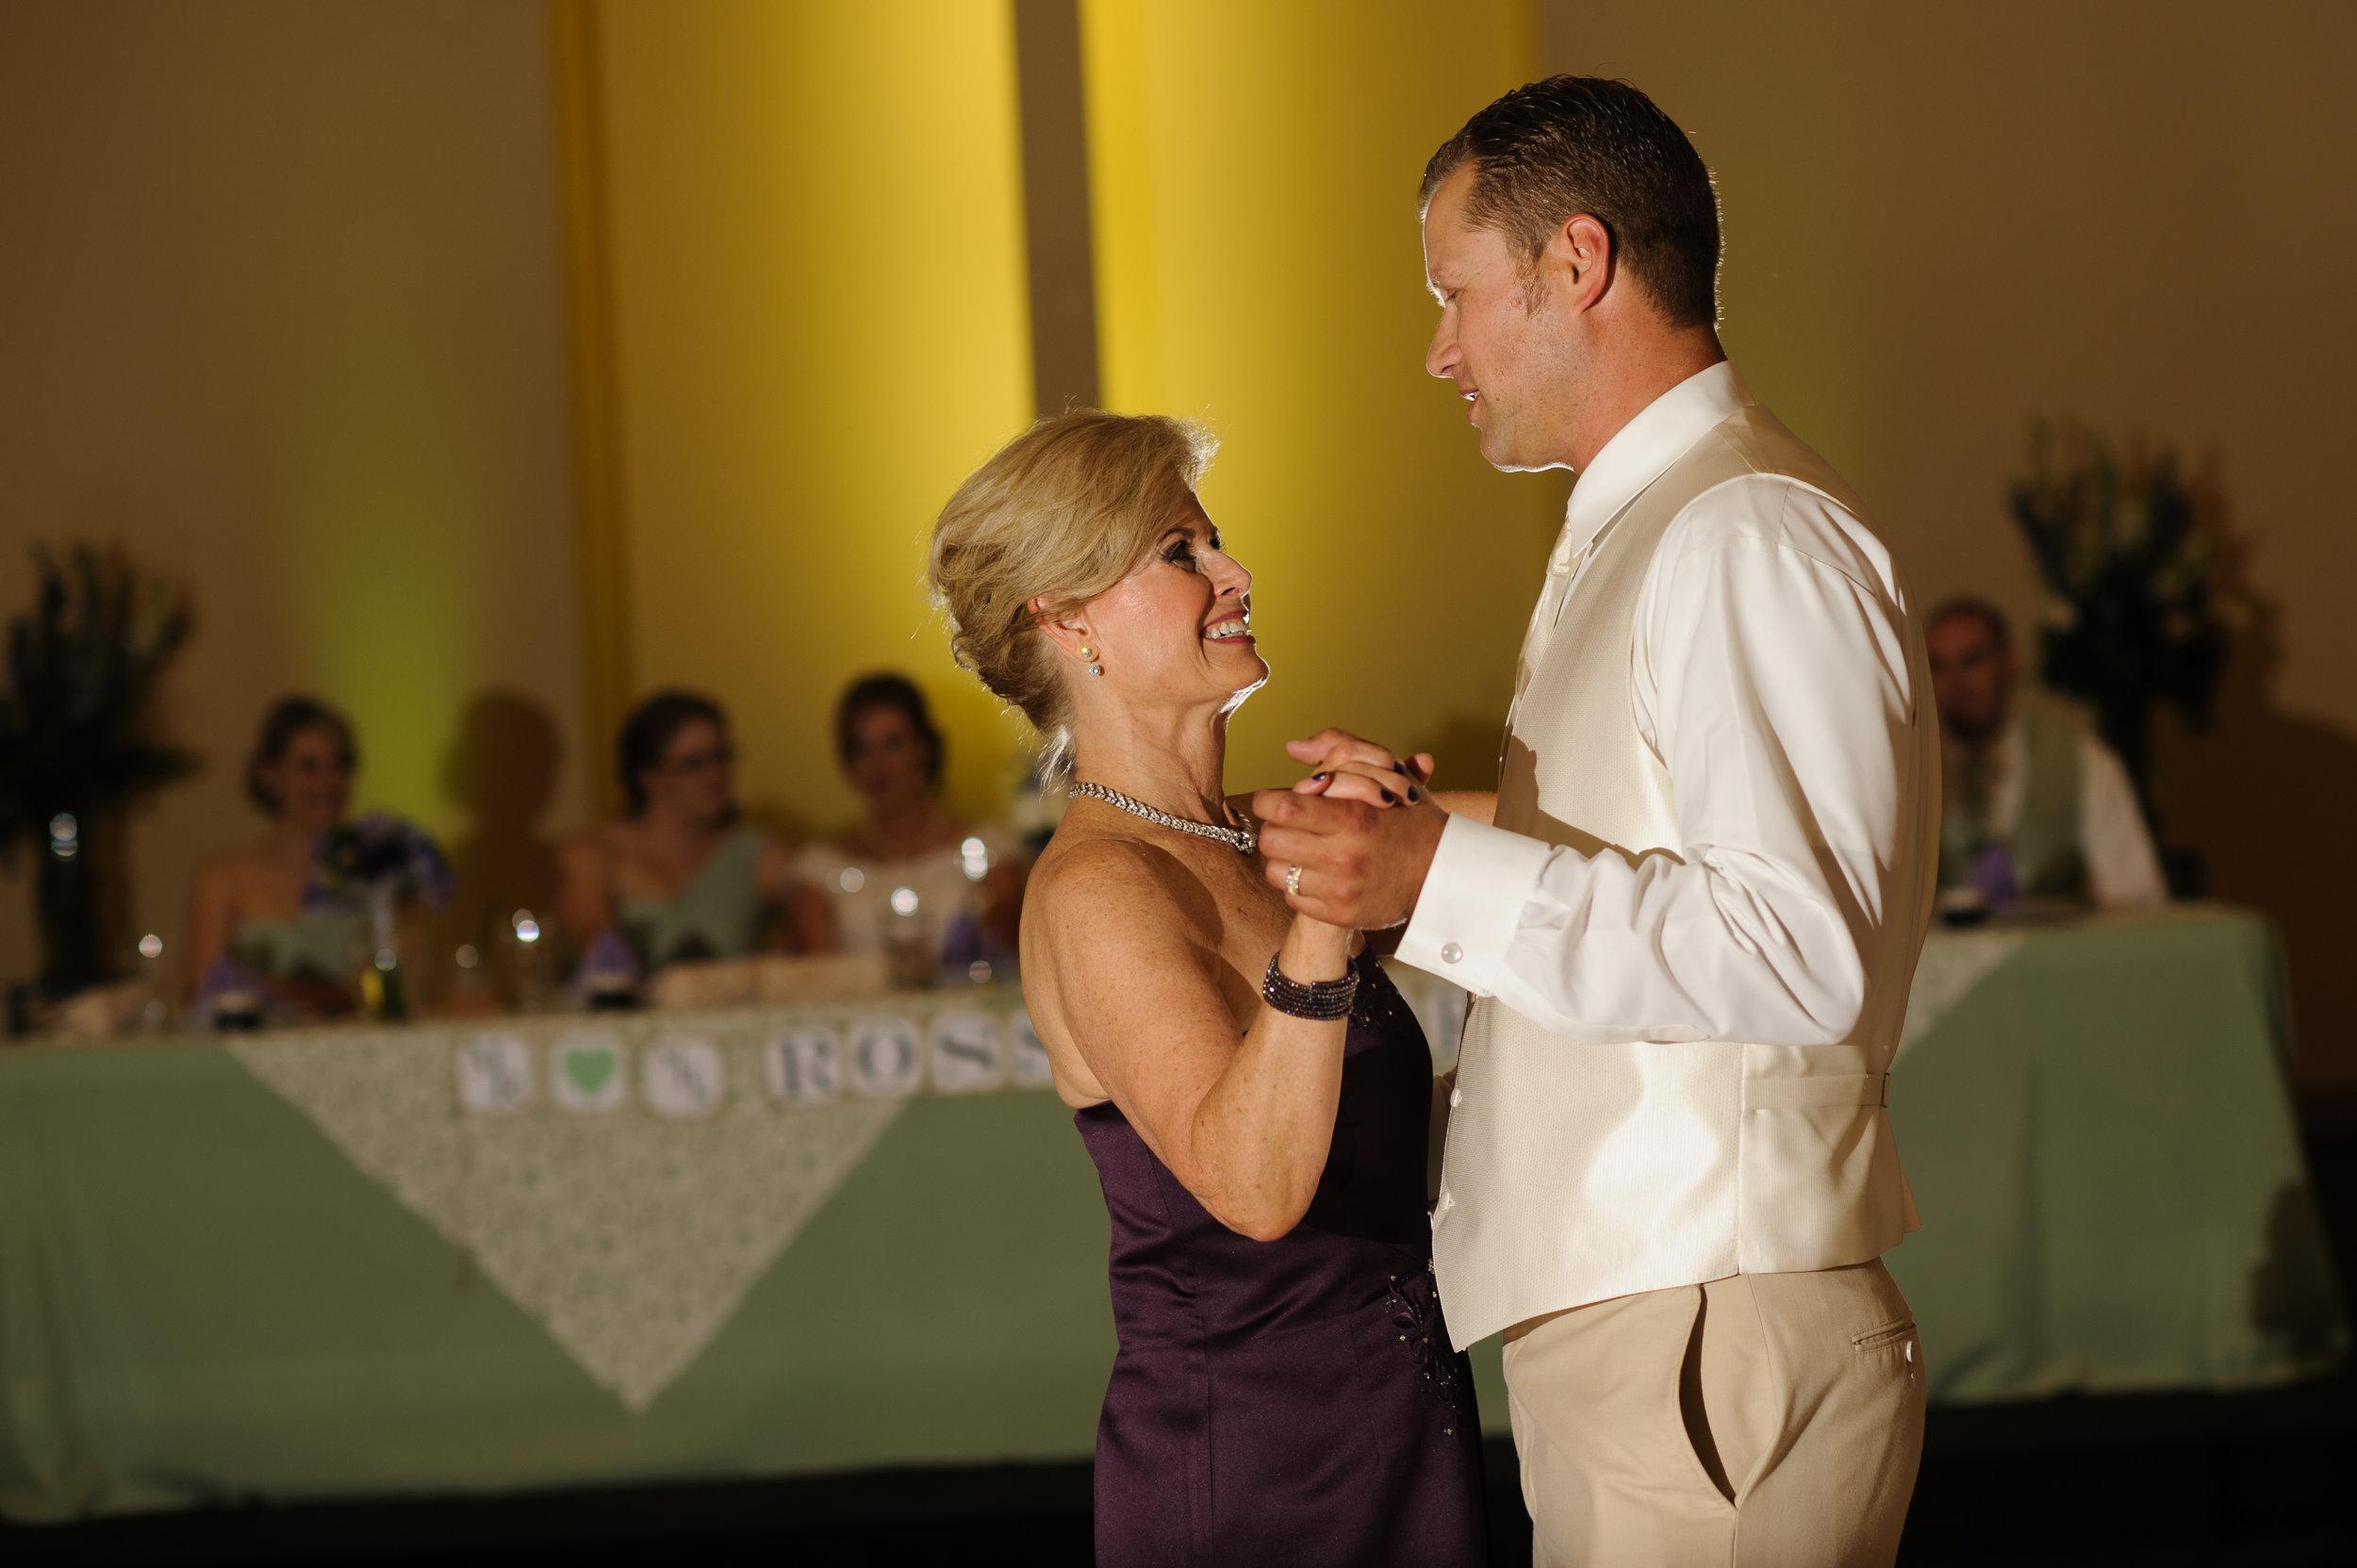 danielle-ross-022-sacramento-wedding-photographer-katherine-nicole-photography.JPG